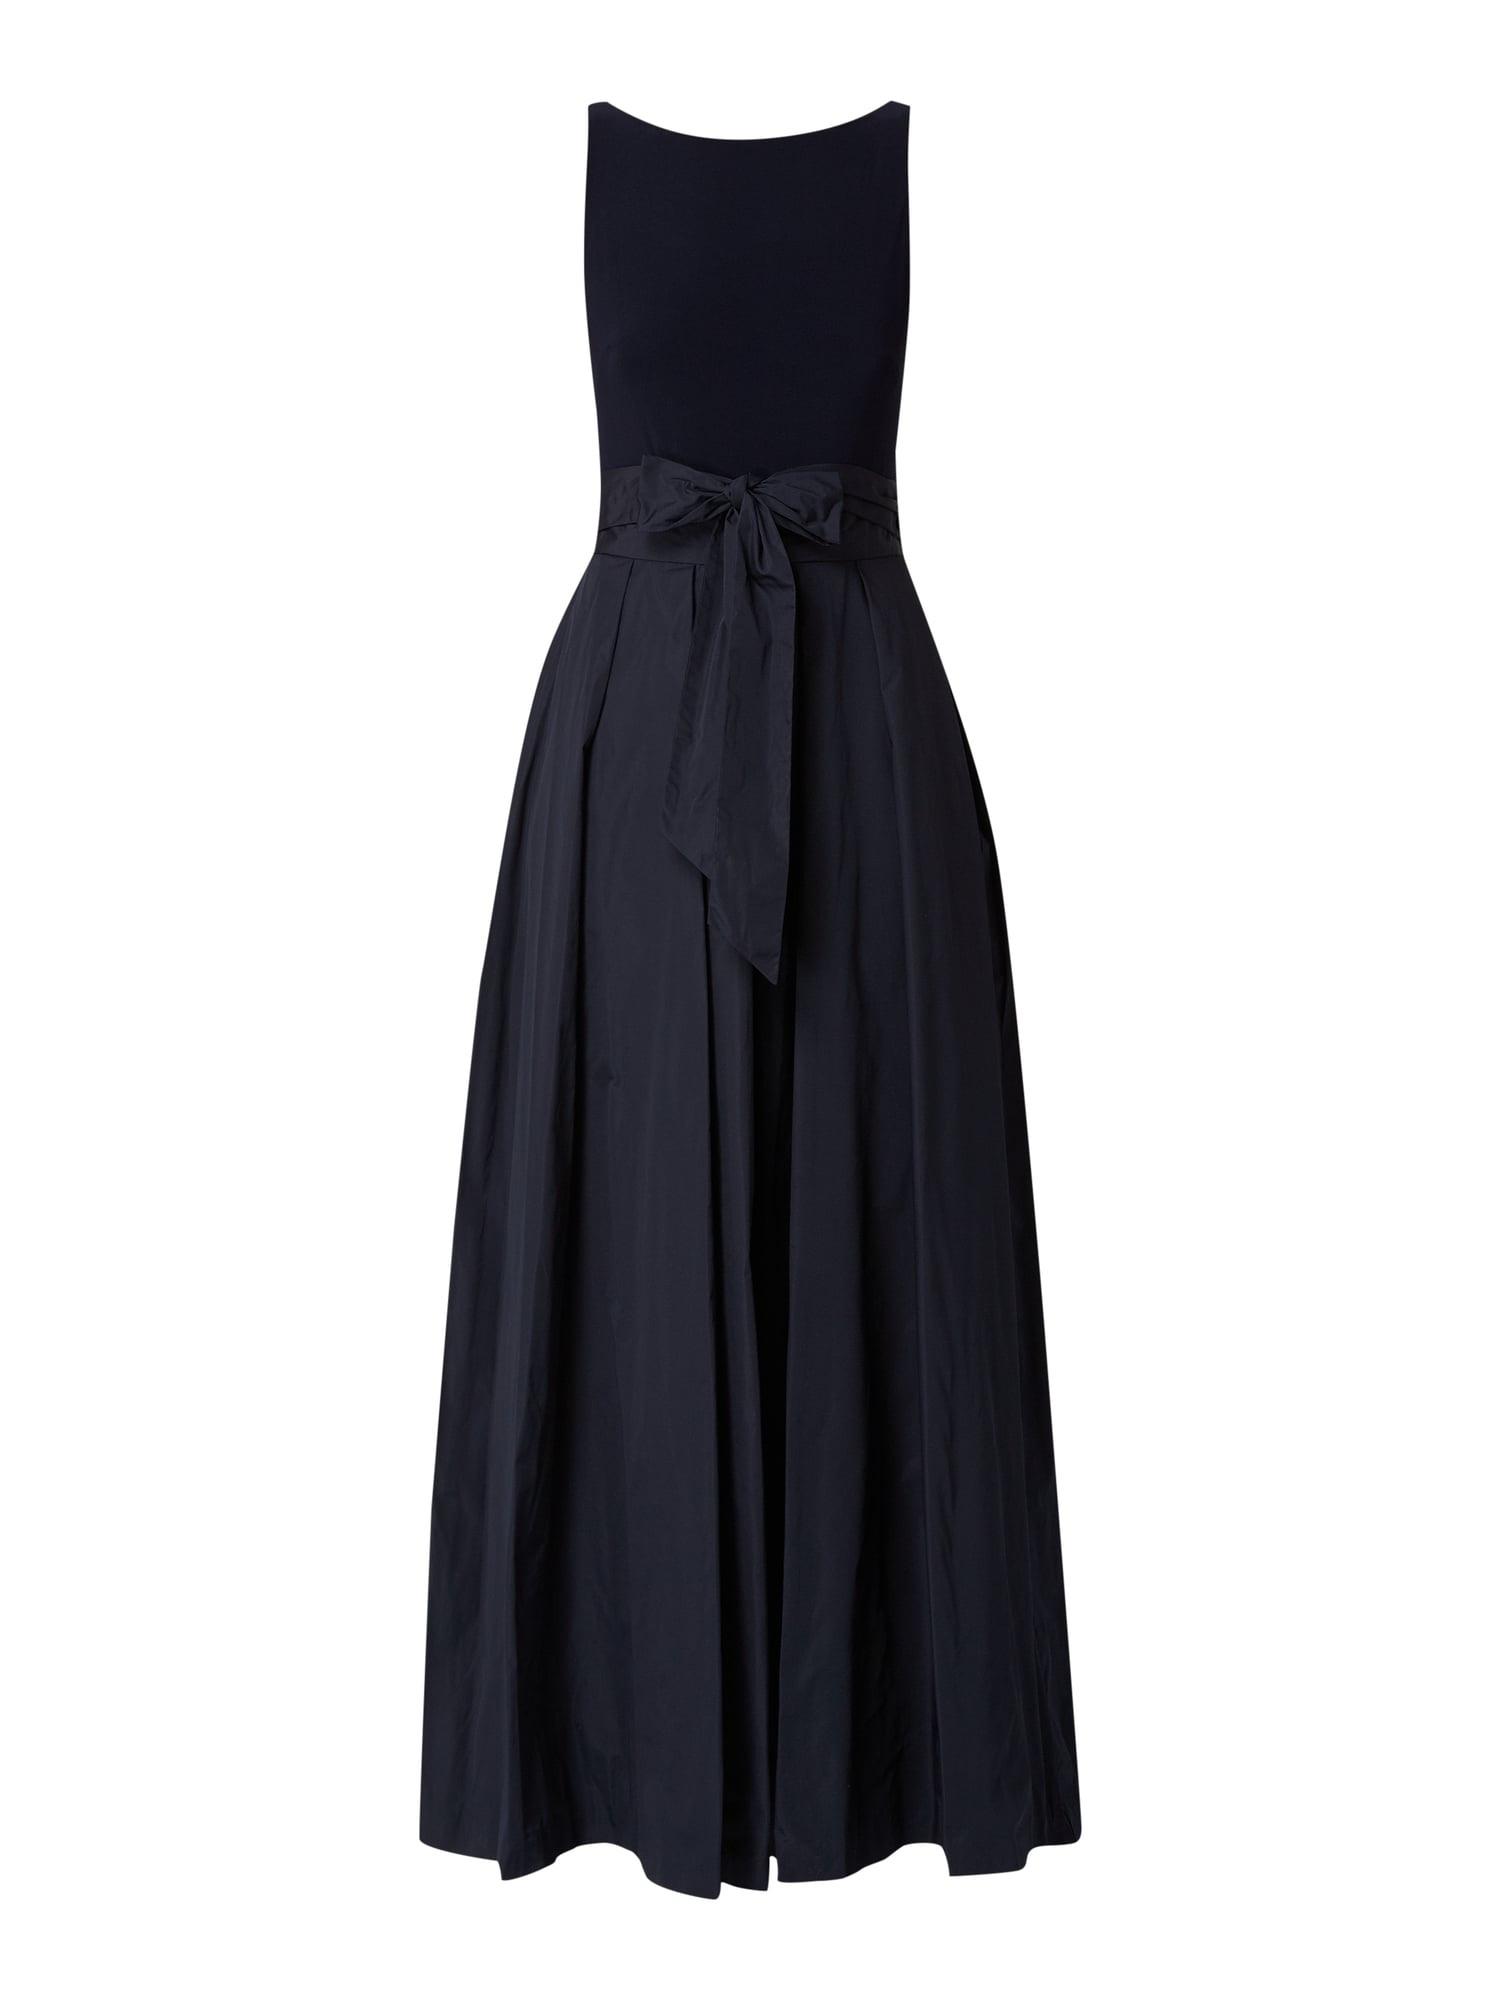 15 Wunderbar Ralph Lauren Abendkleid StylishDesigner Coolste Ralph Lauren Abendkleid Bester Preis